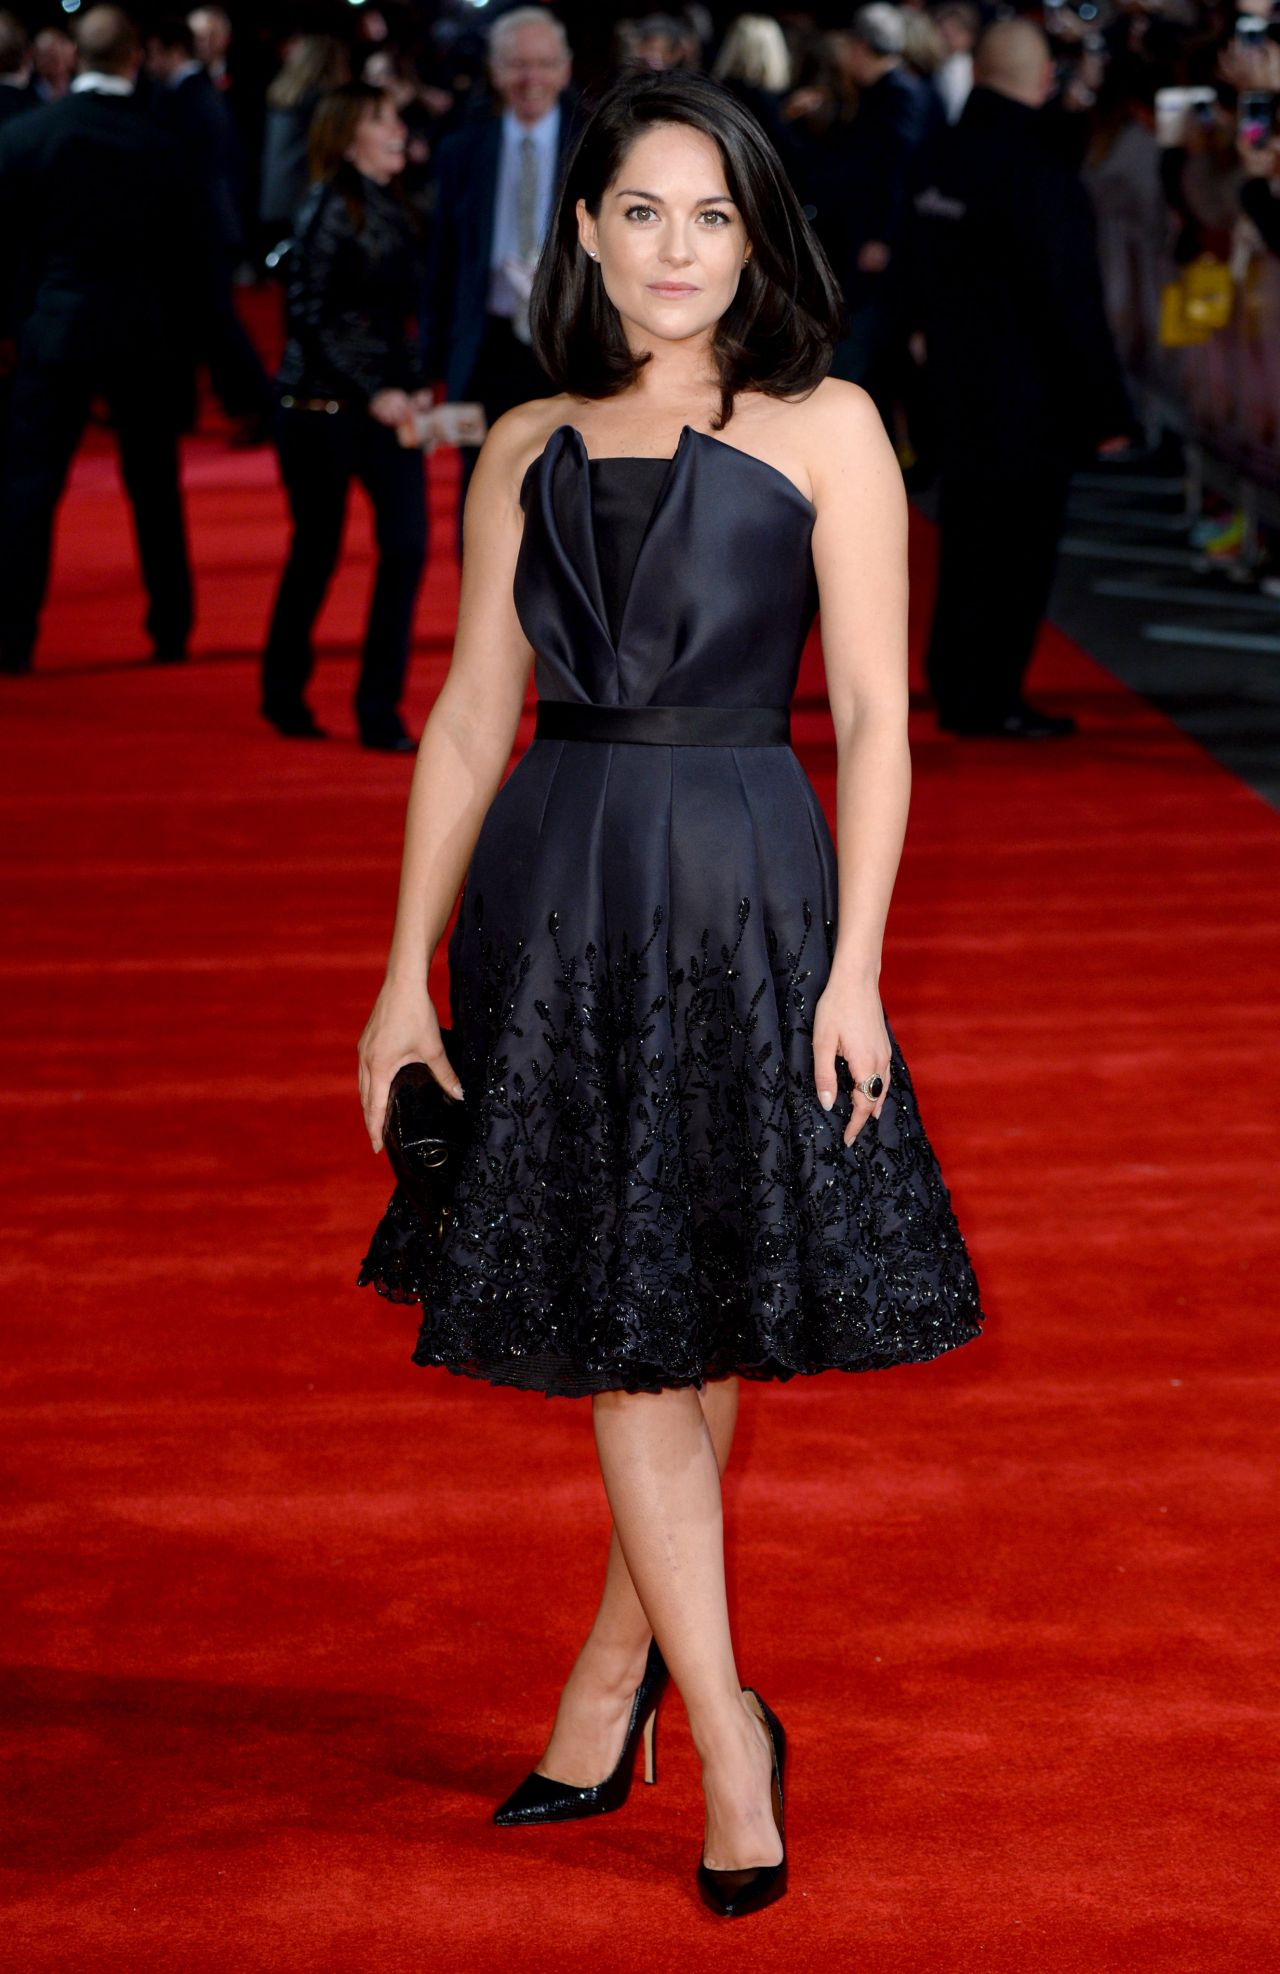 Sarah Greene Burnt Premiere In London